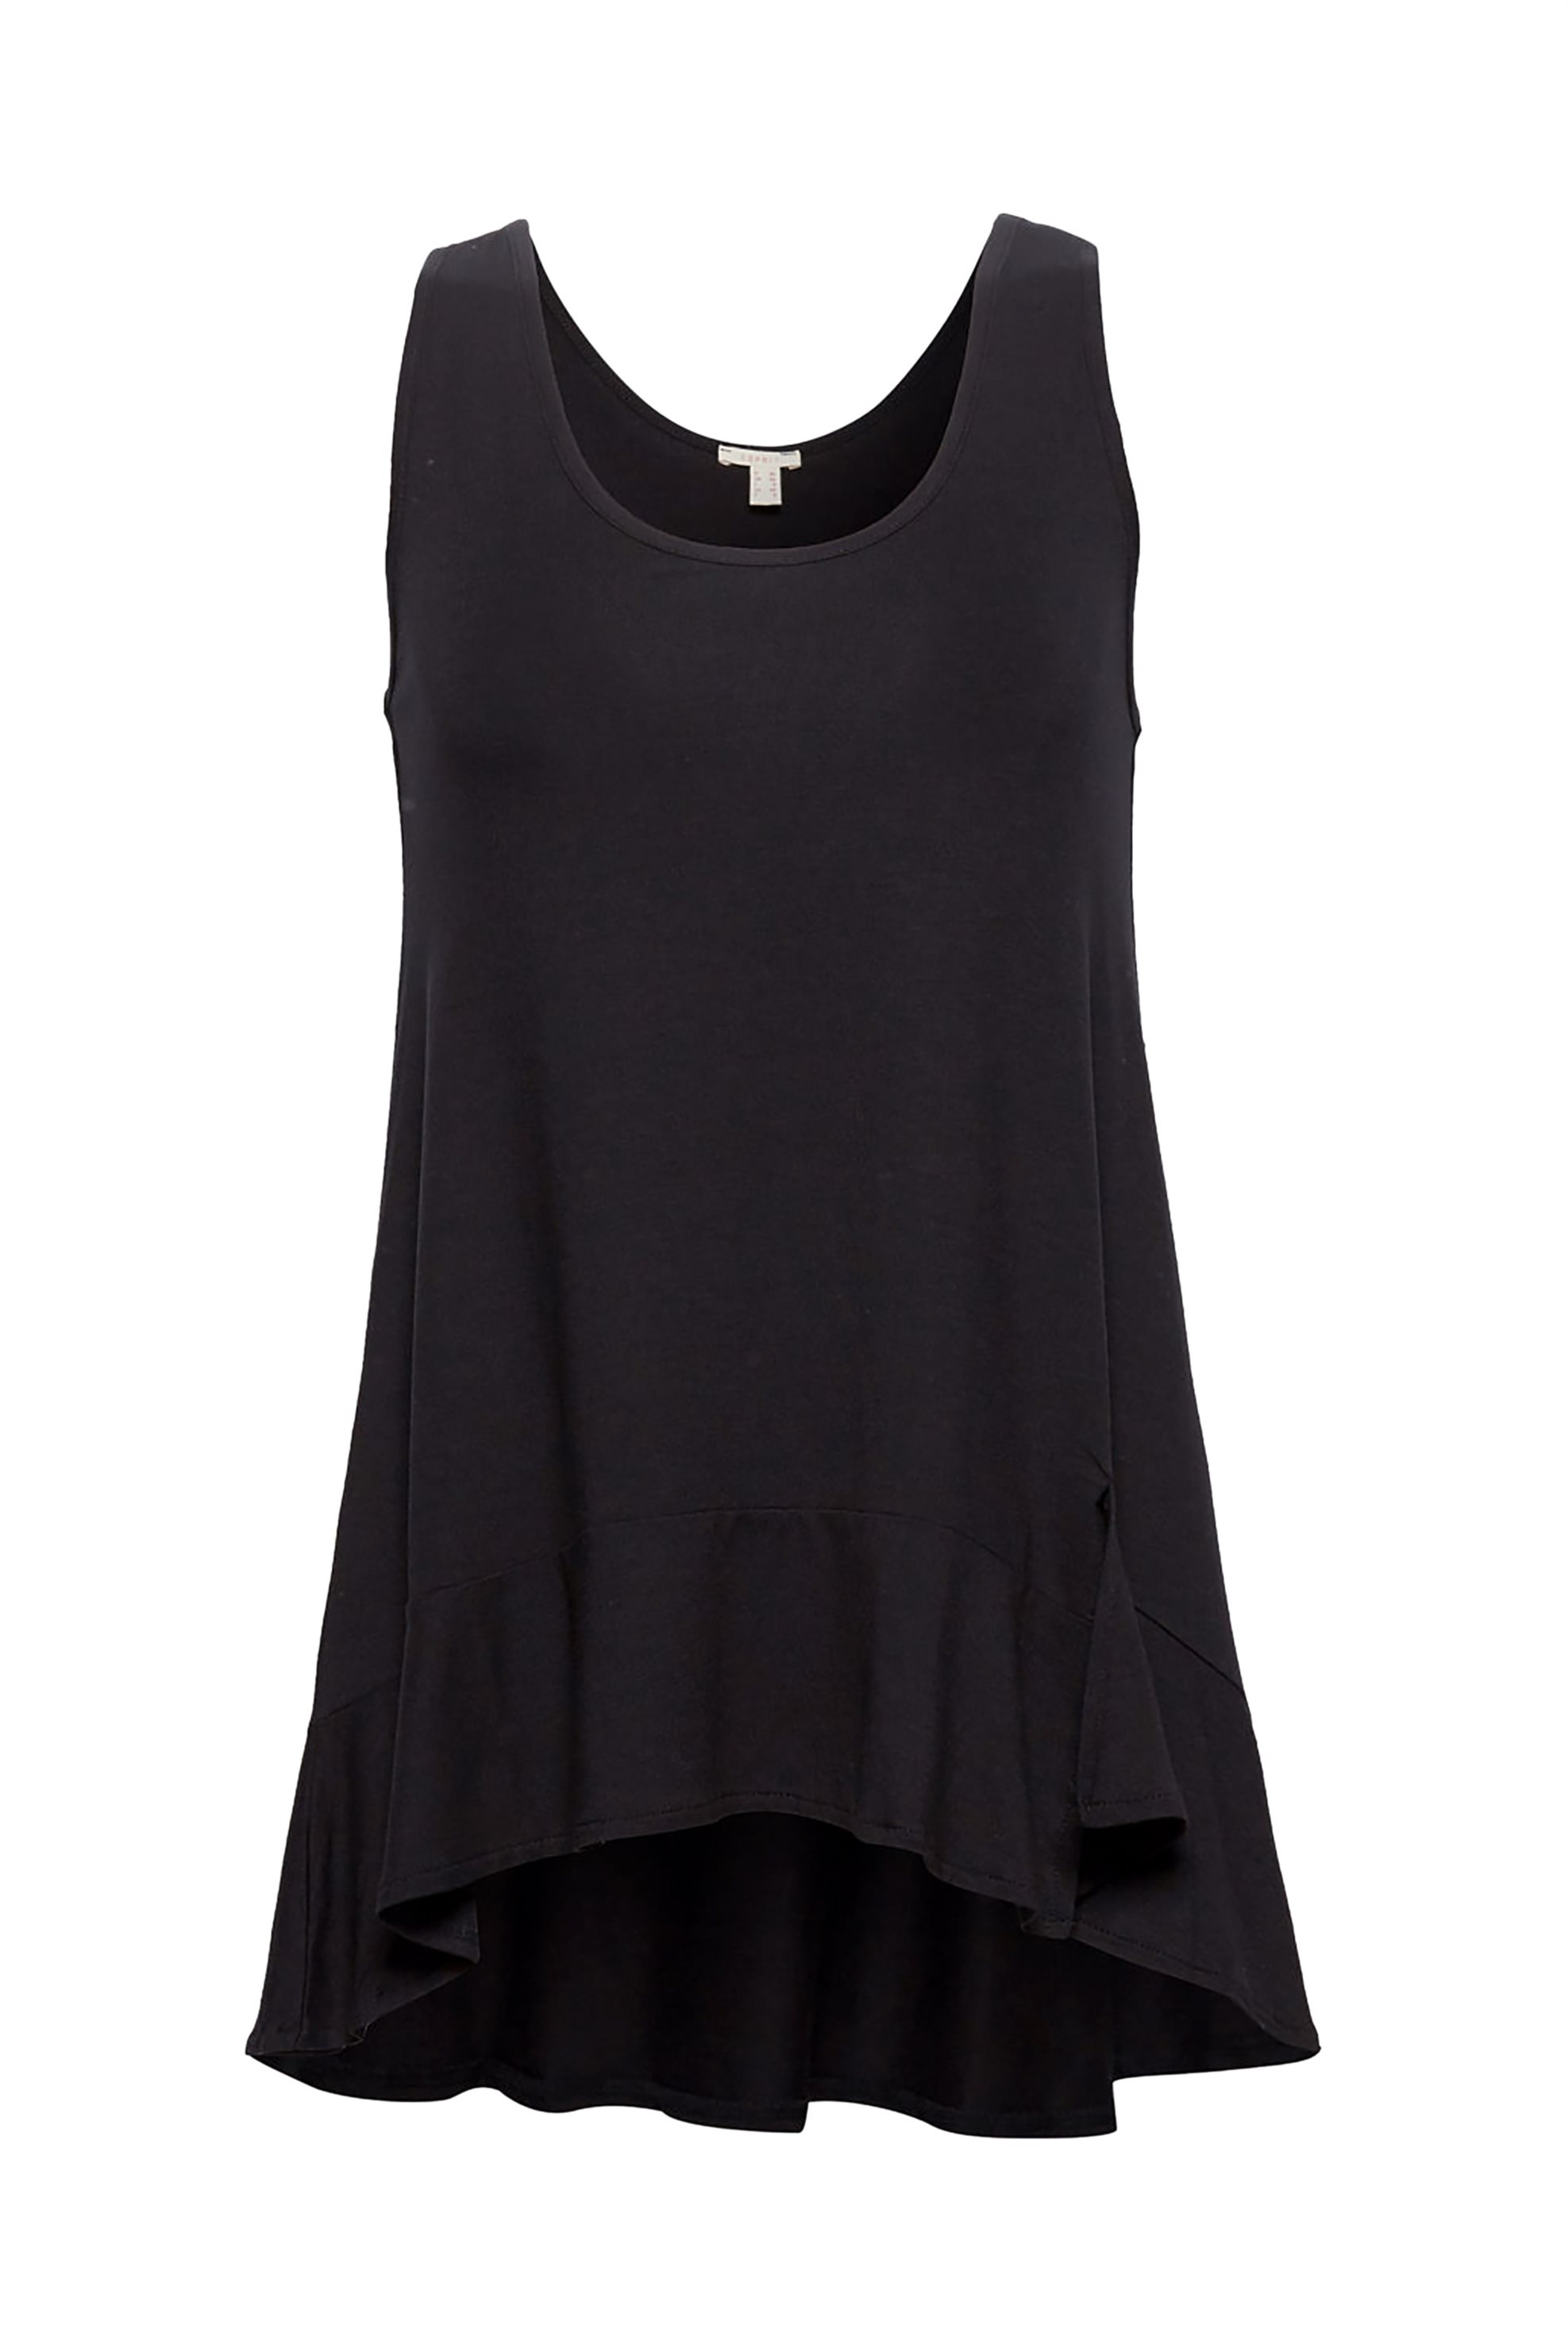 Esprit γυναικεία μπλούζα με βολάν - 078EE1K013 - Μαύρο γυναικα   ρουχα   tops   αμάνικα